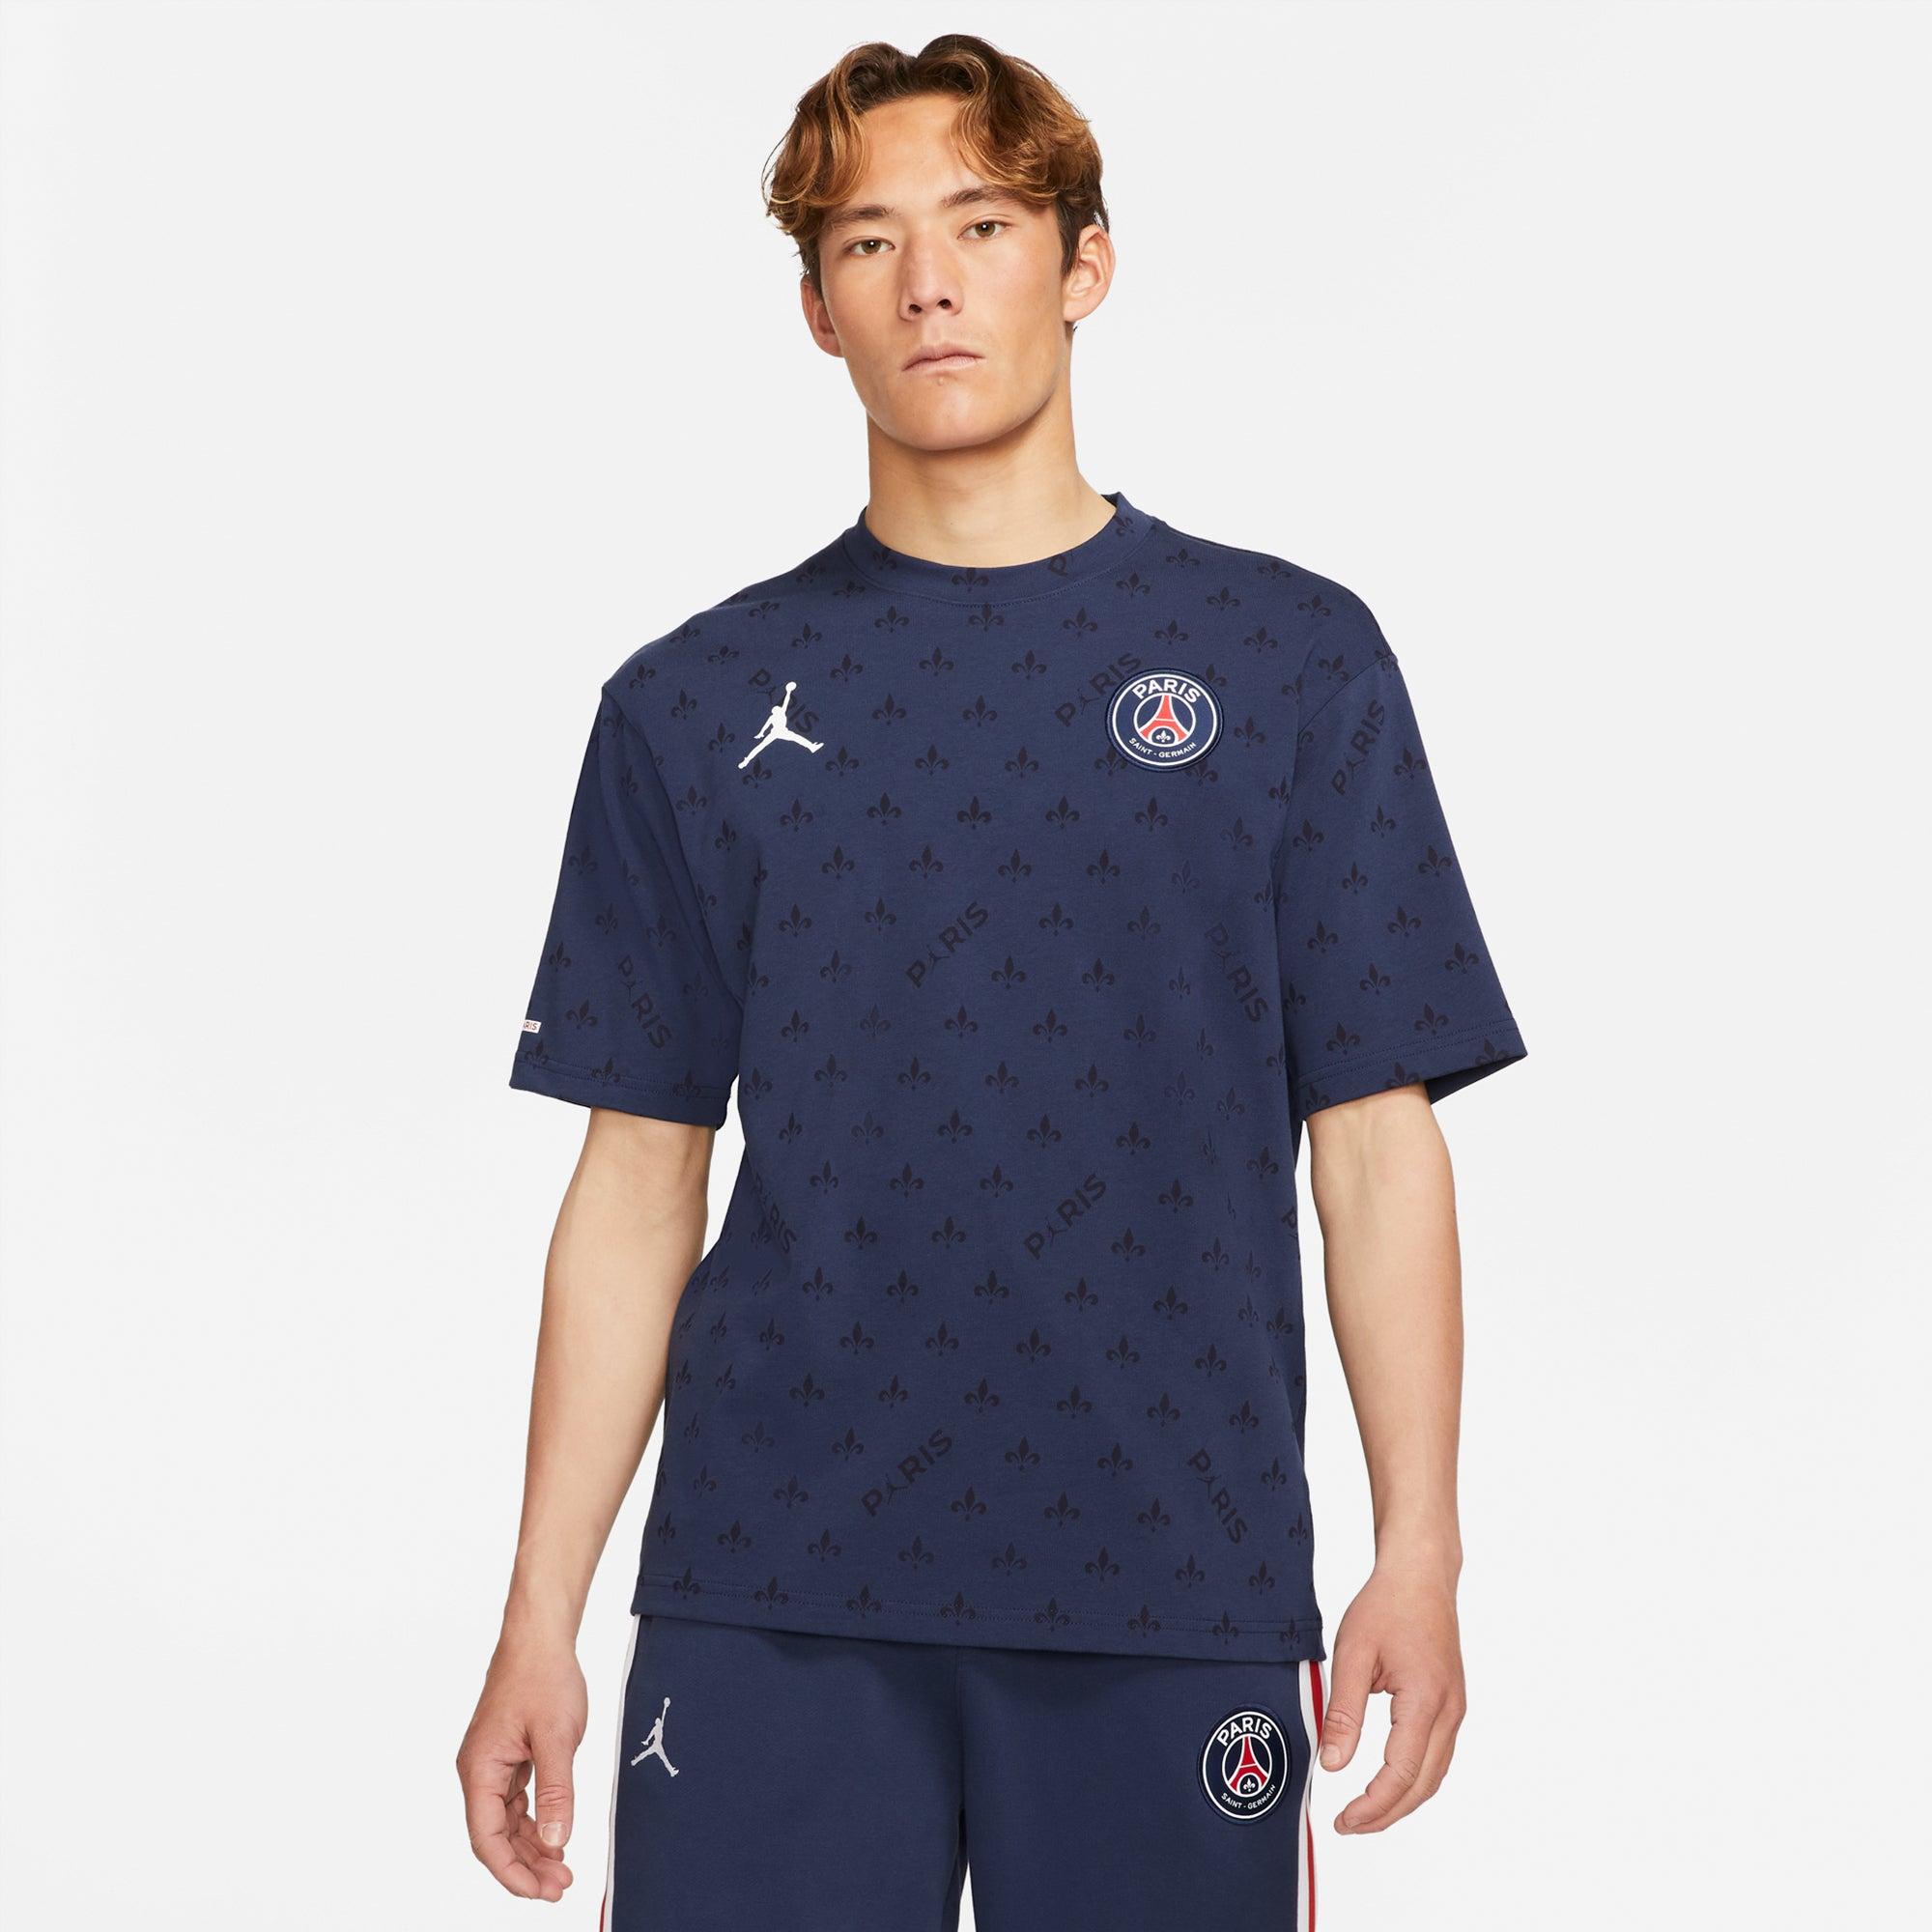 Jordan PSG T-shirt